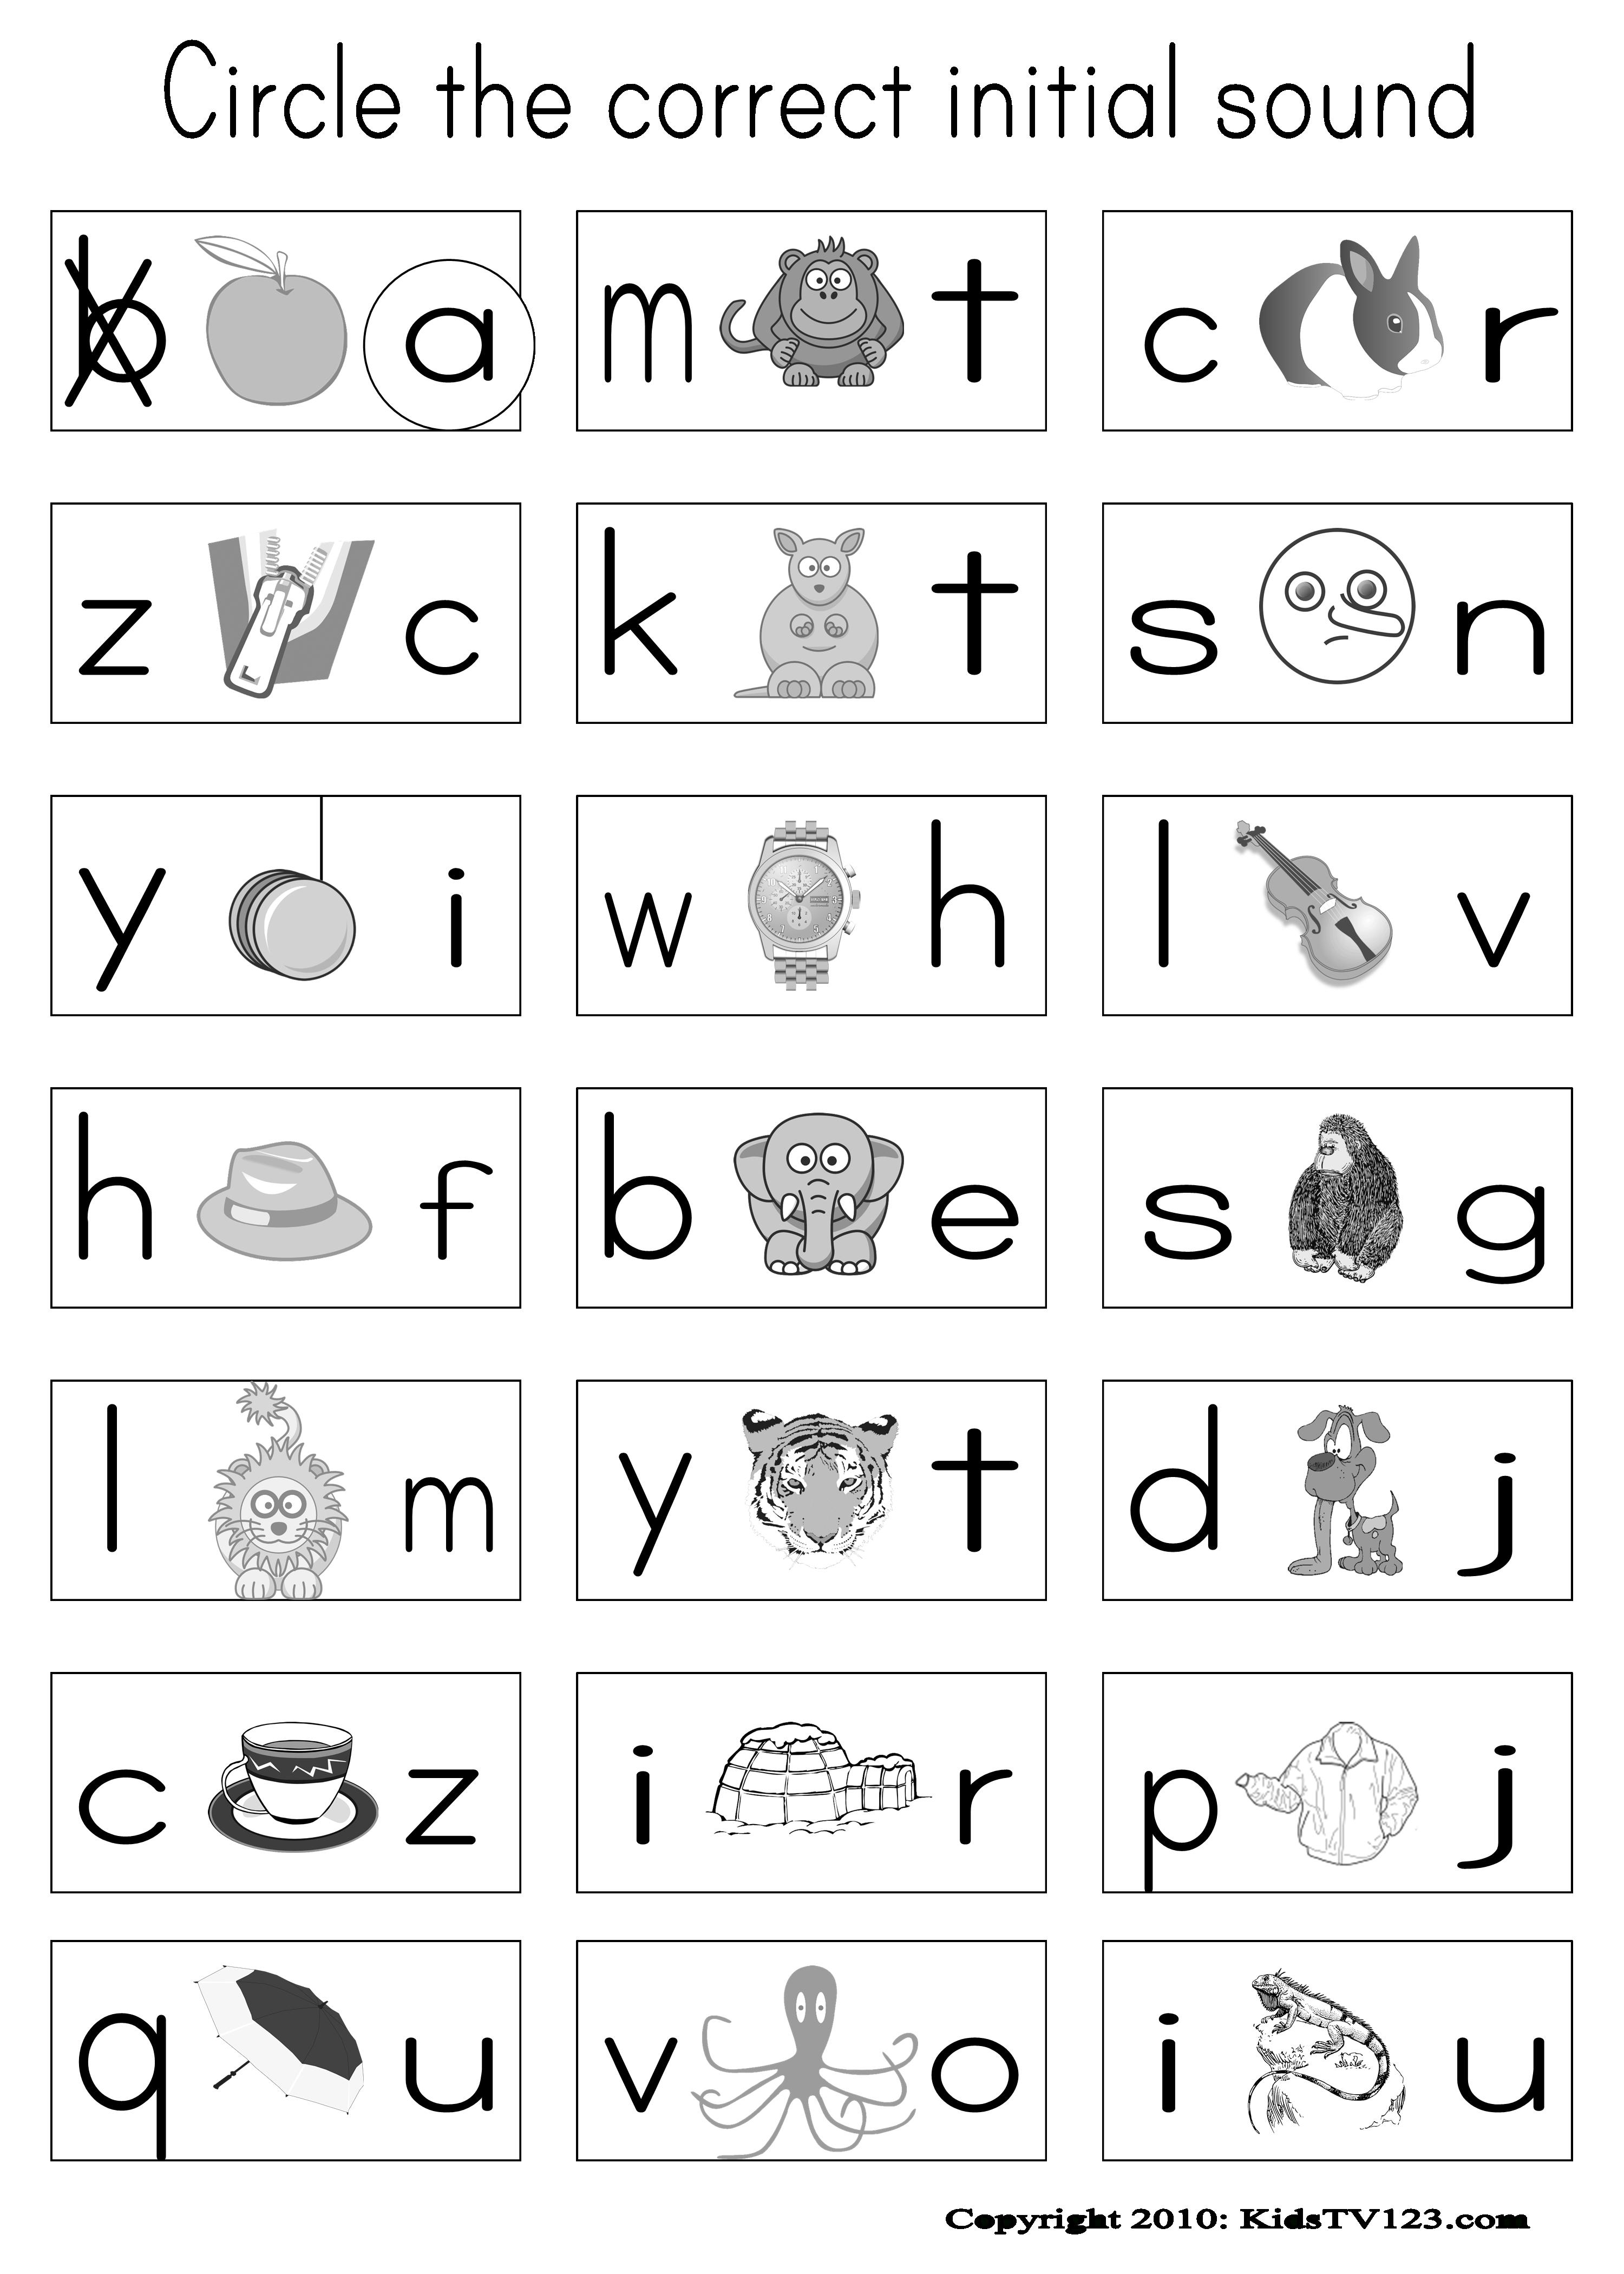 Kidstv123 - Phonics Worksheets | Classroom-Reading & Phonics | Phonics Worksheets For Adults Printable